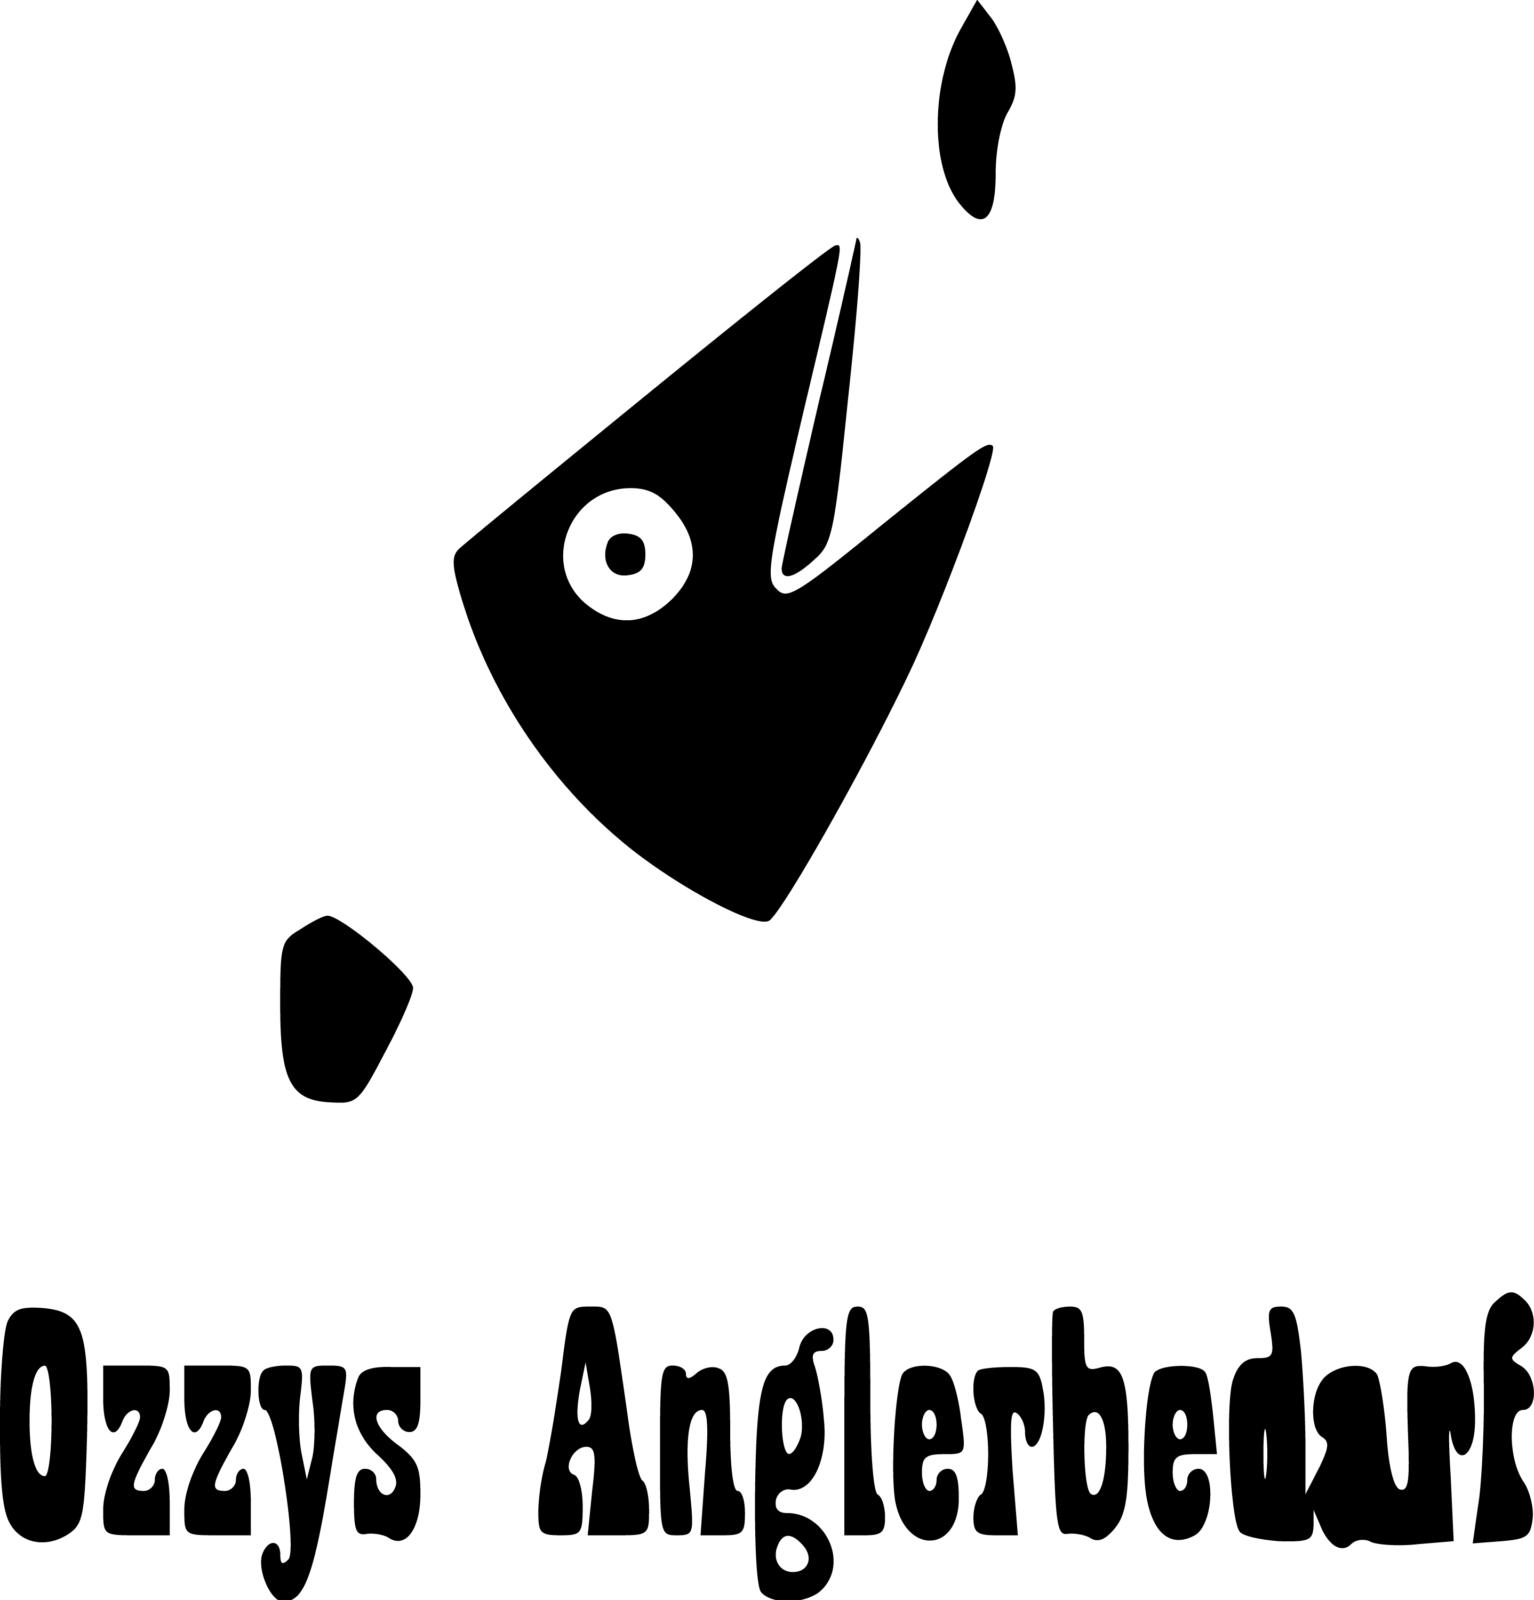 Logo Ozzys Anglerbedarf - Vectorization | BANNERKÖNIG